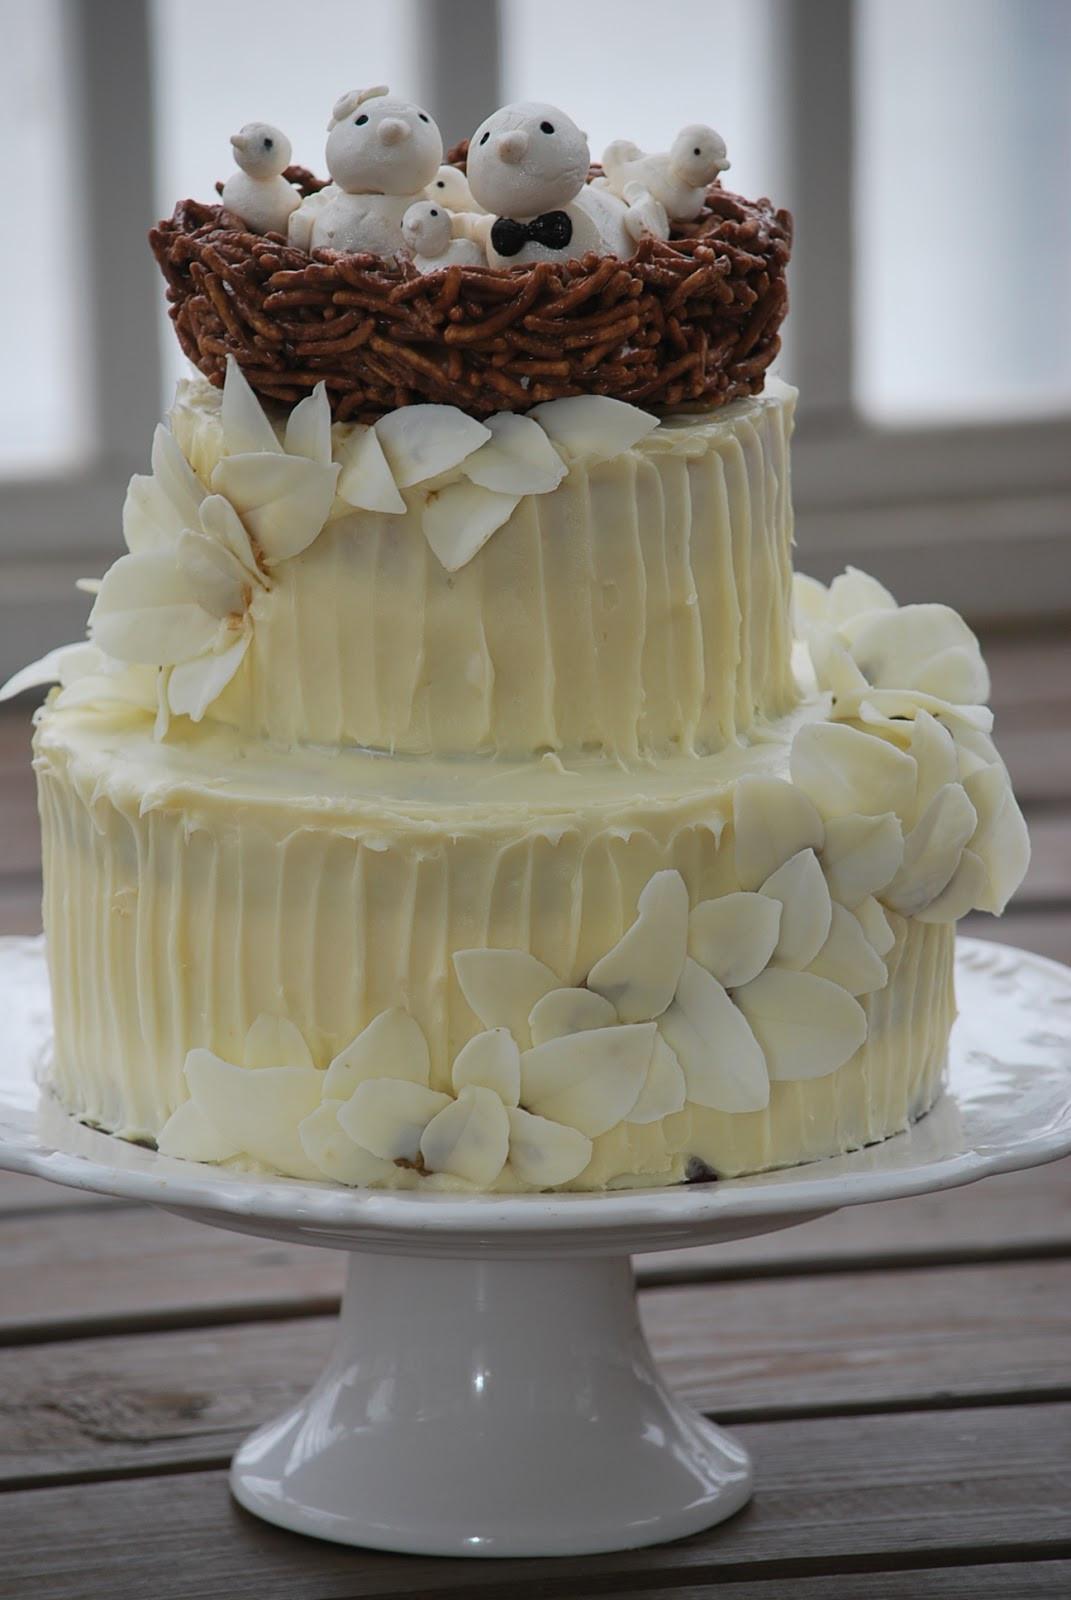 Recipes For Wedding Cakes  My story in recipes Red Velvet Cake